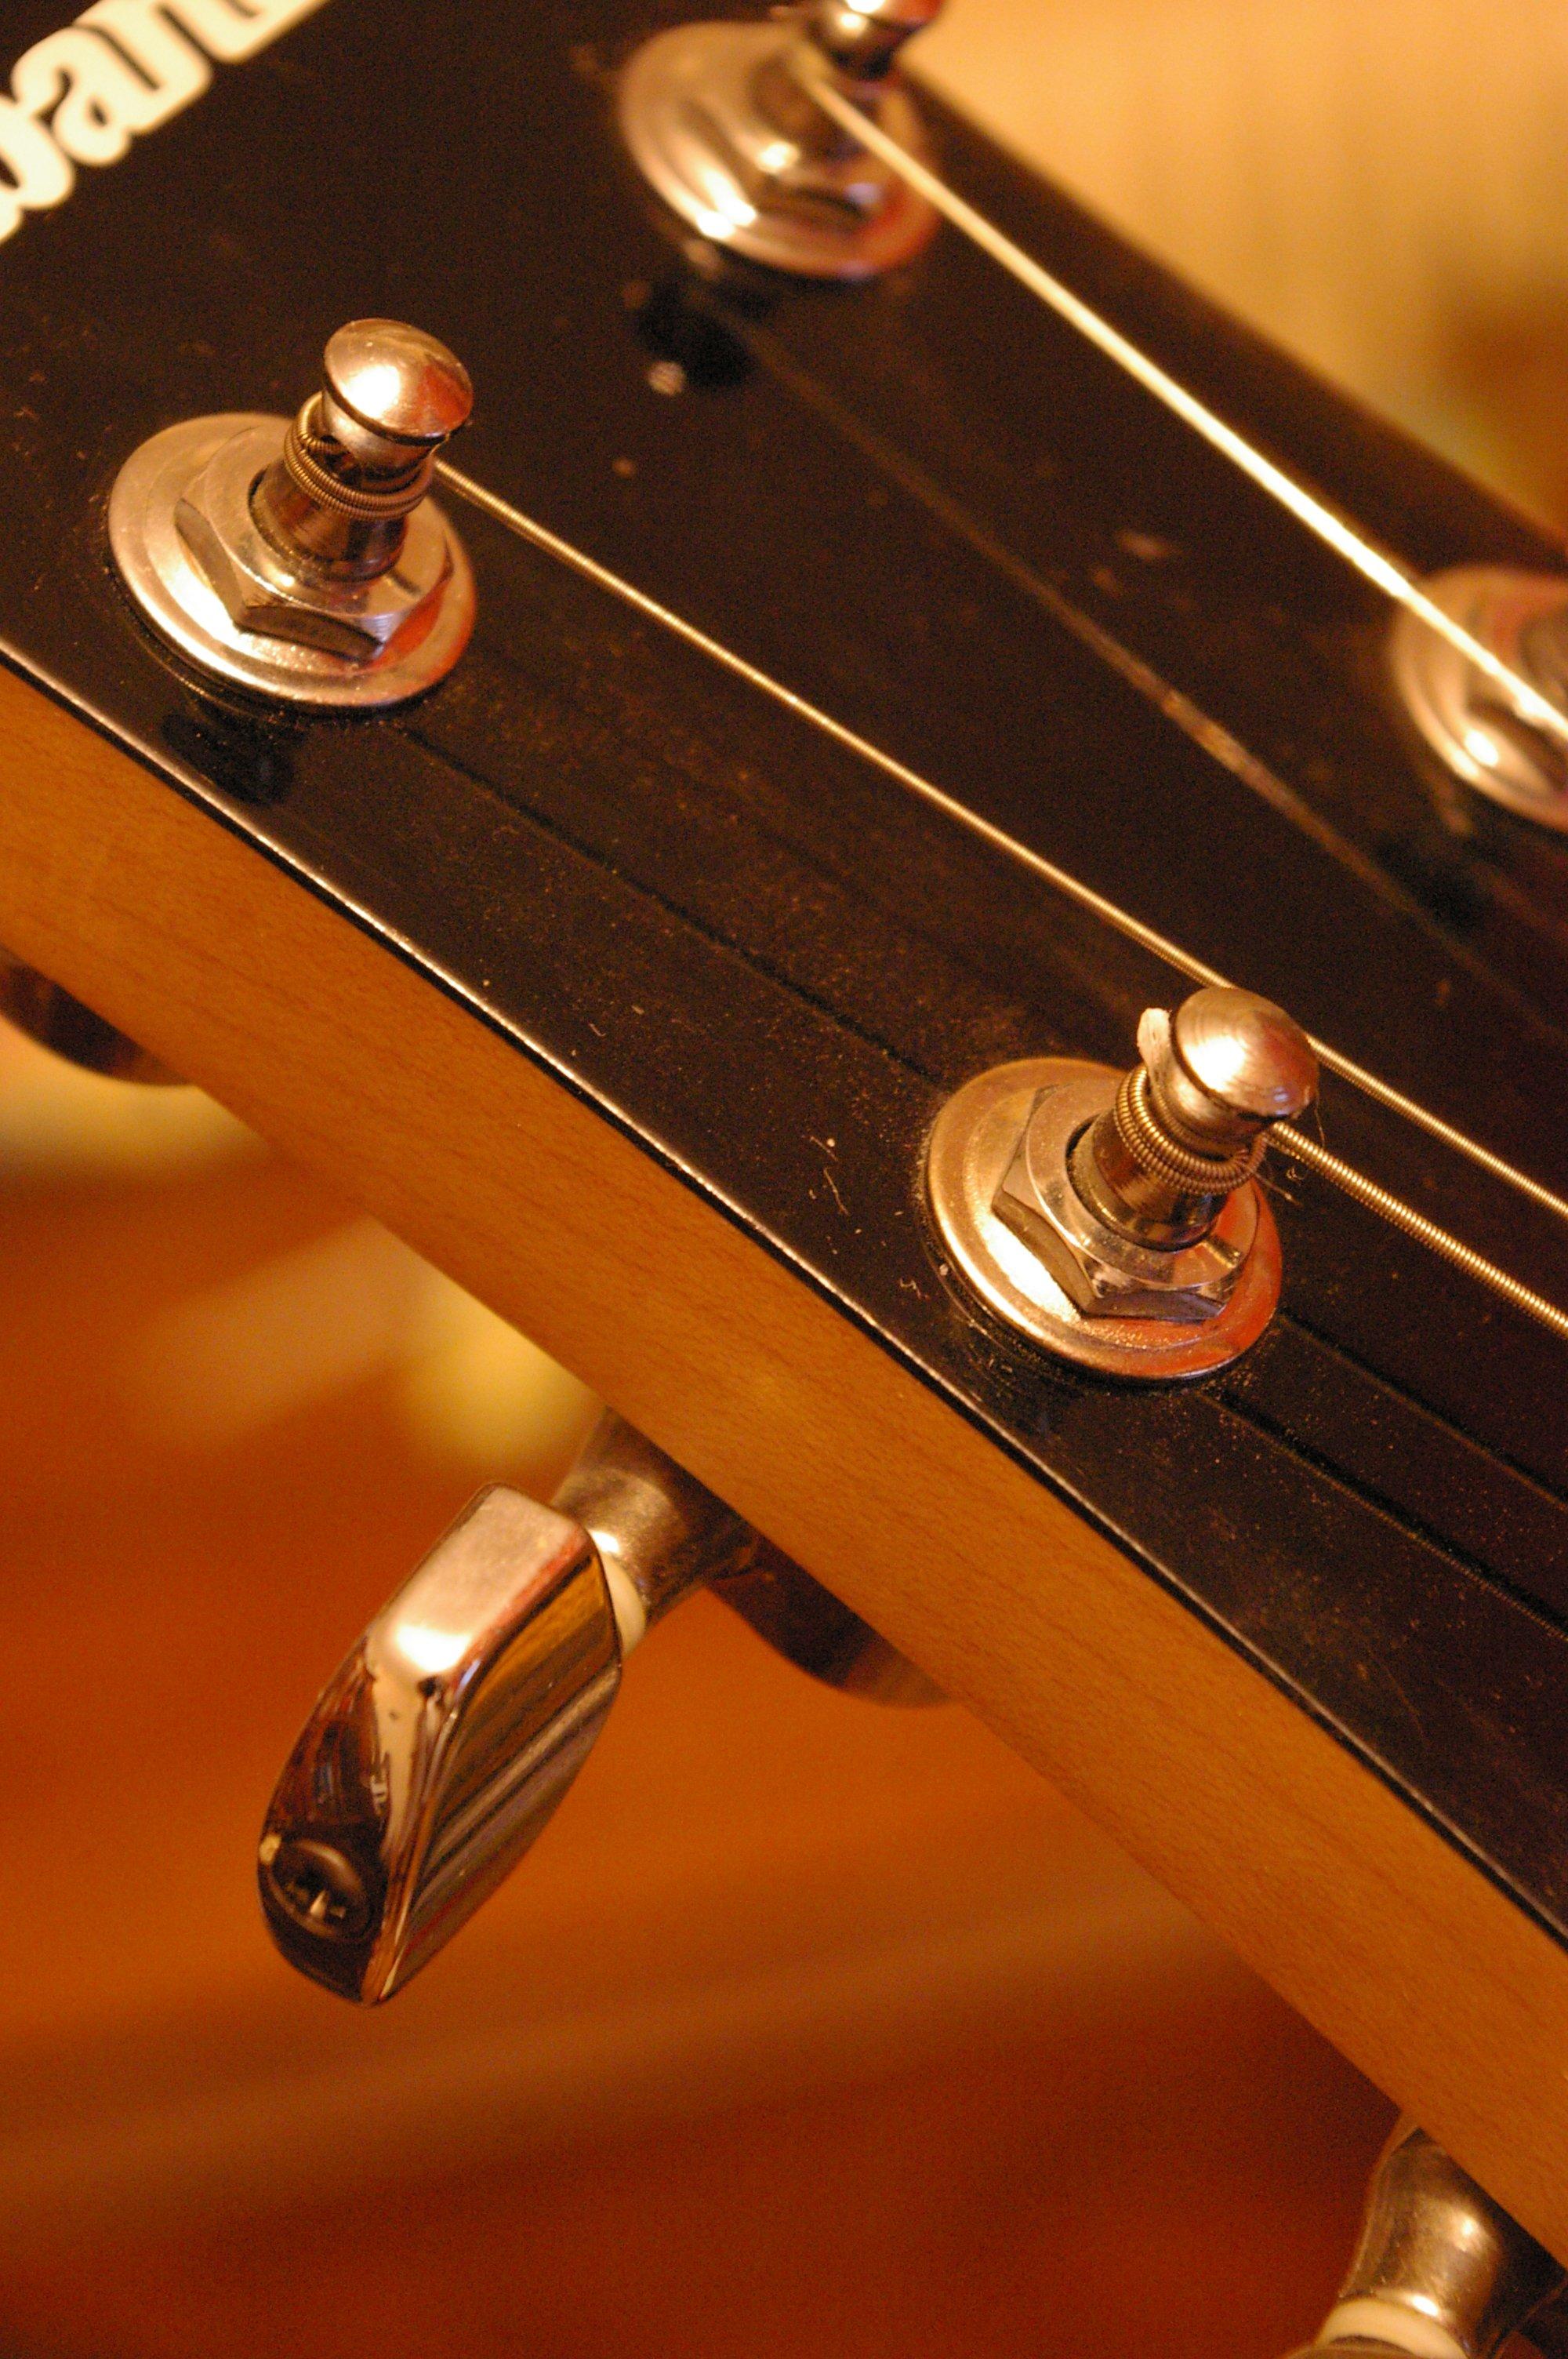 File:Guitare mecanique.jpg - Wikimedia Commons